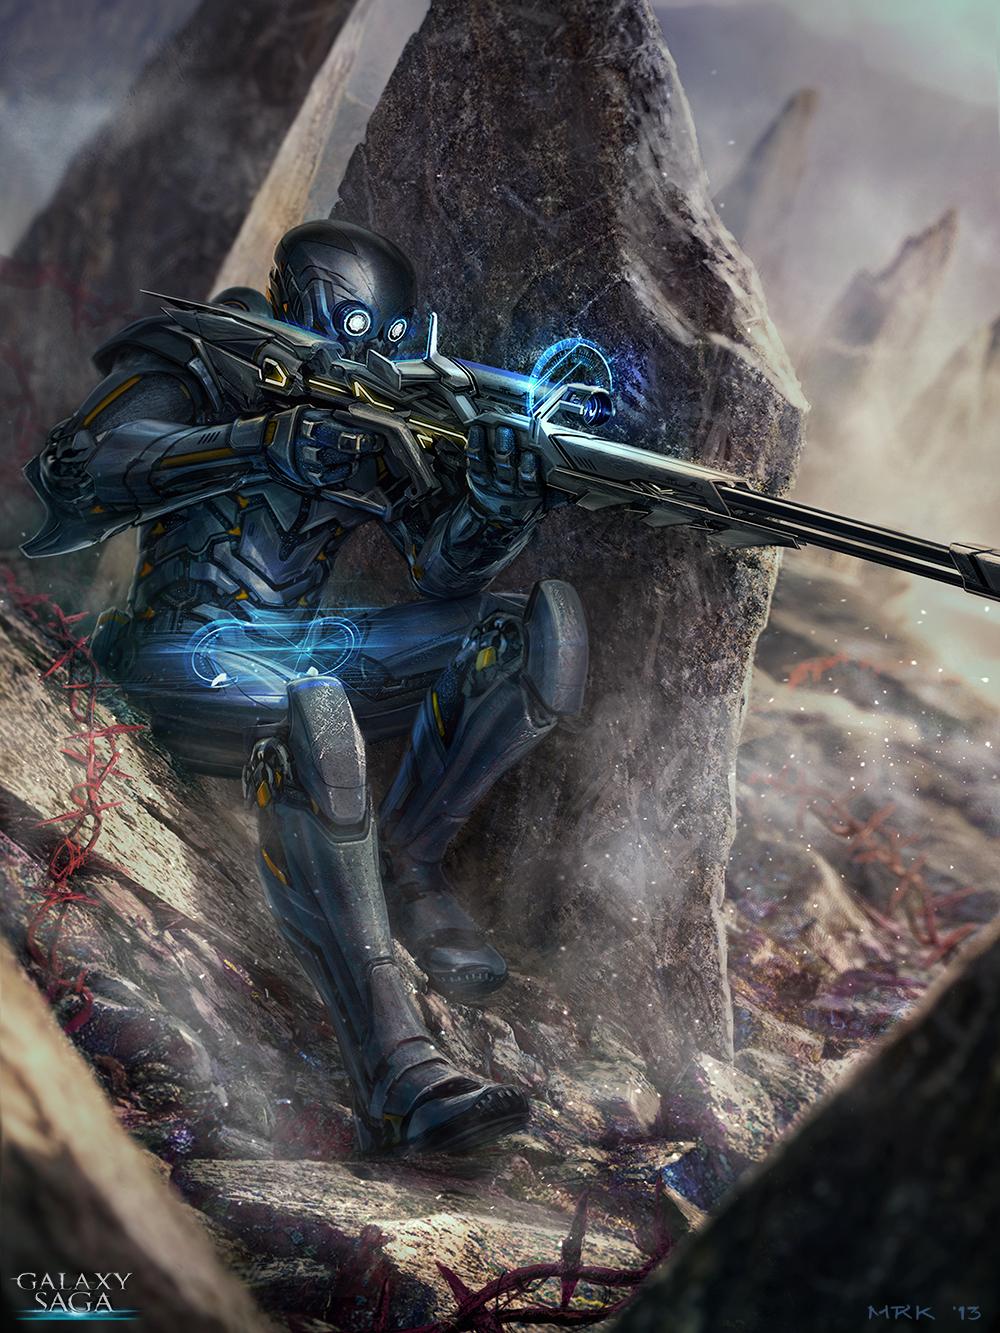 Bogdanmrk the sniper regular